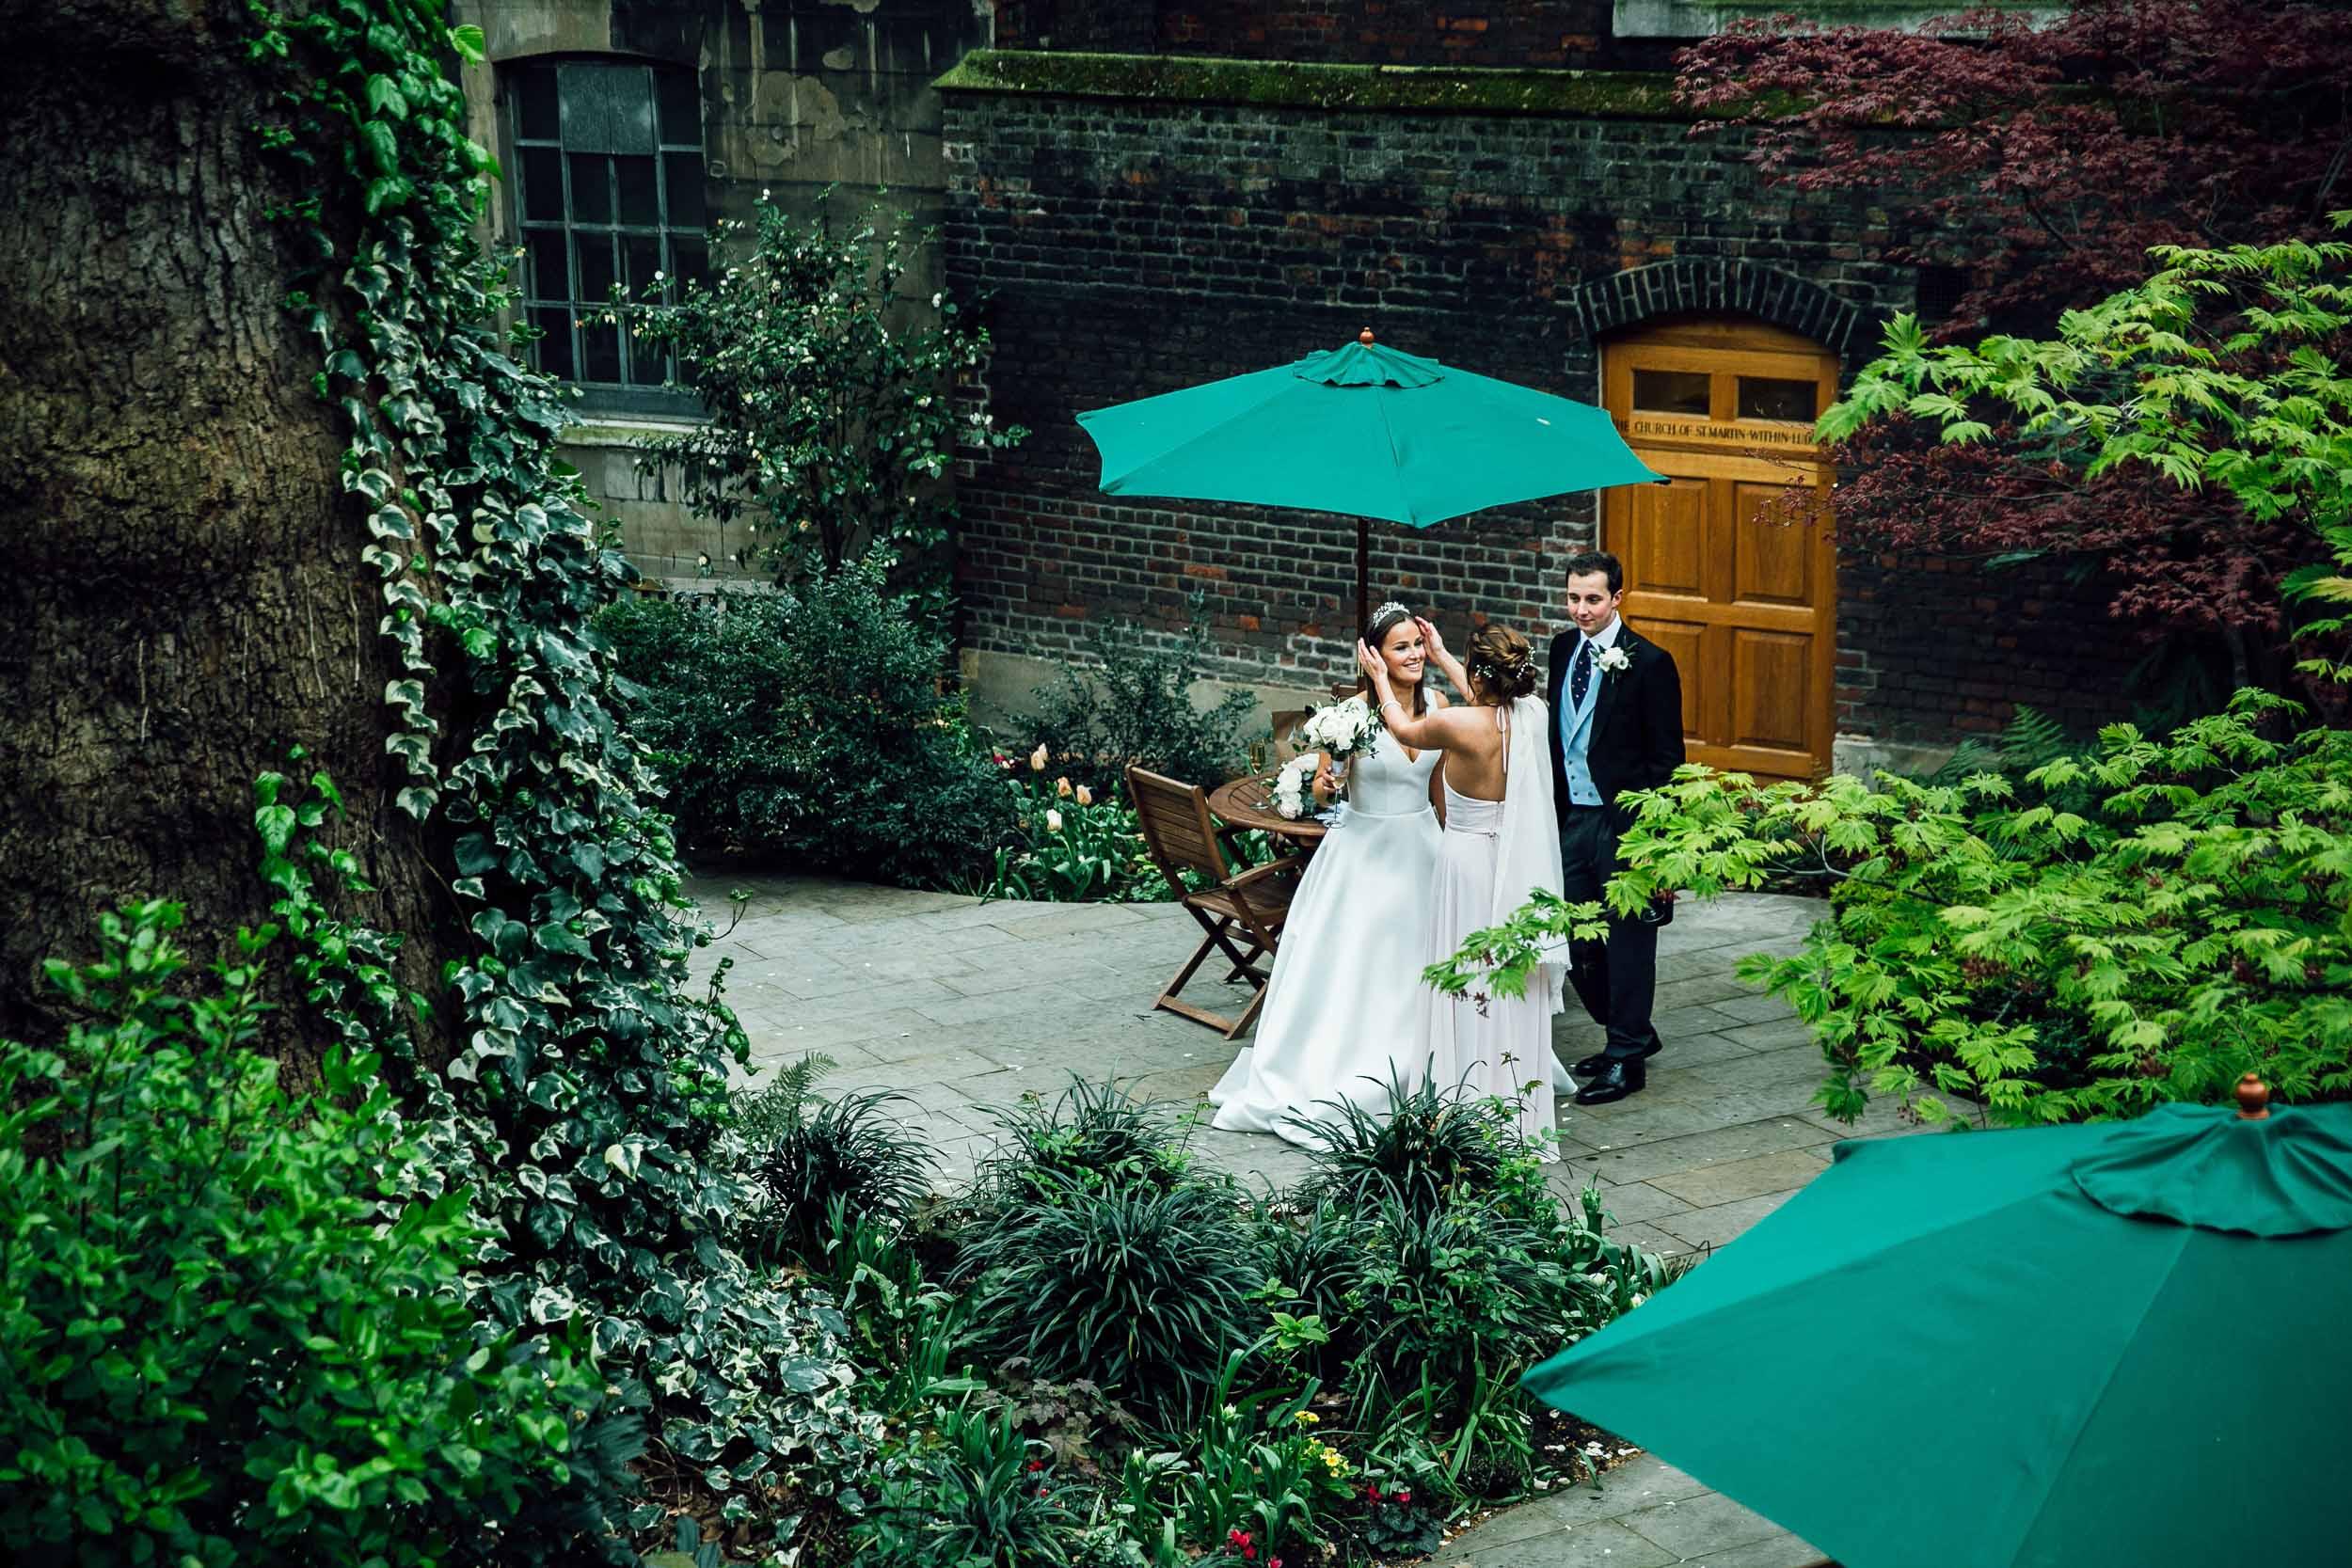 stationers-hall-wedding-photographer-london 083.jpg